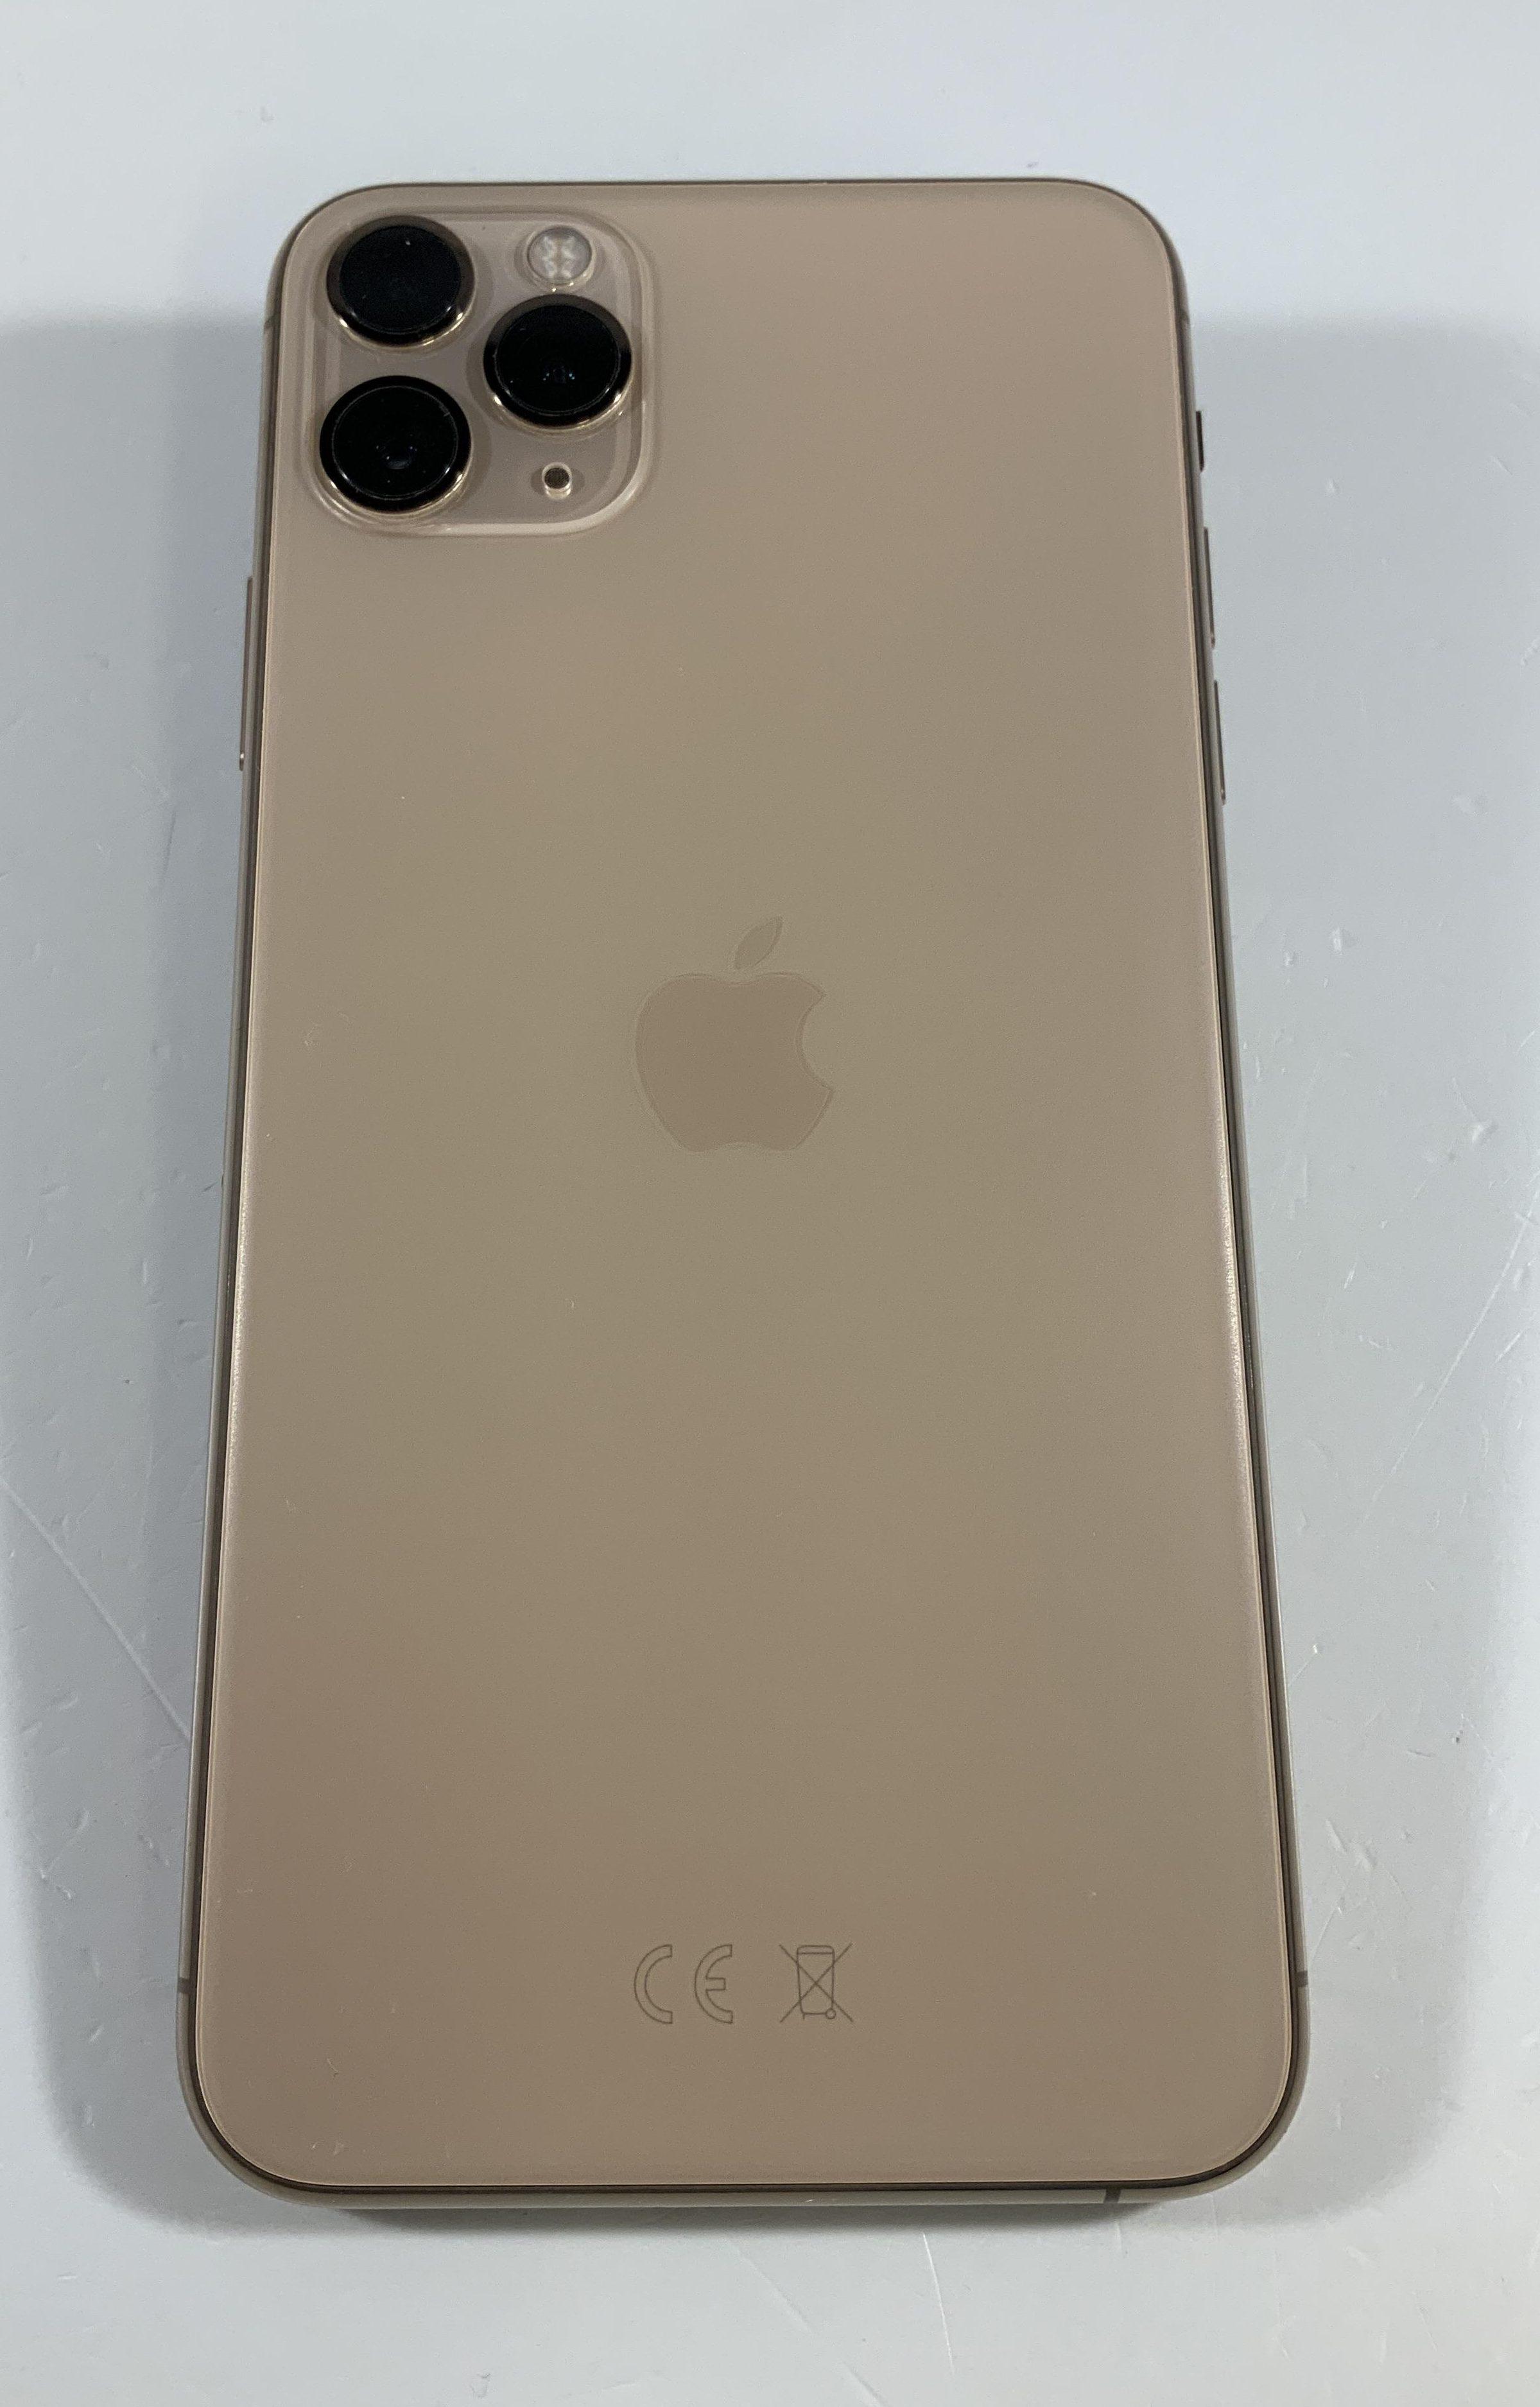 iPhone 11 Pro Max 512GB, 512GB, Gold, immagine 2